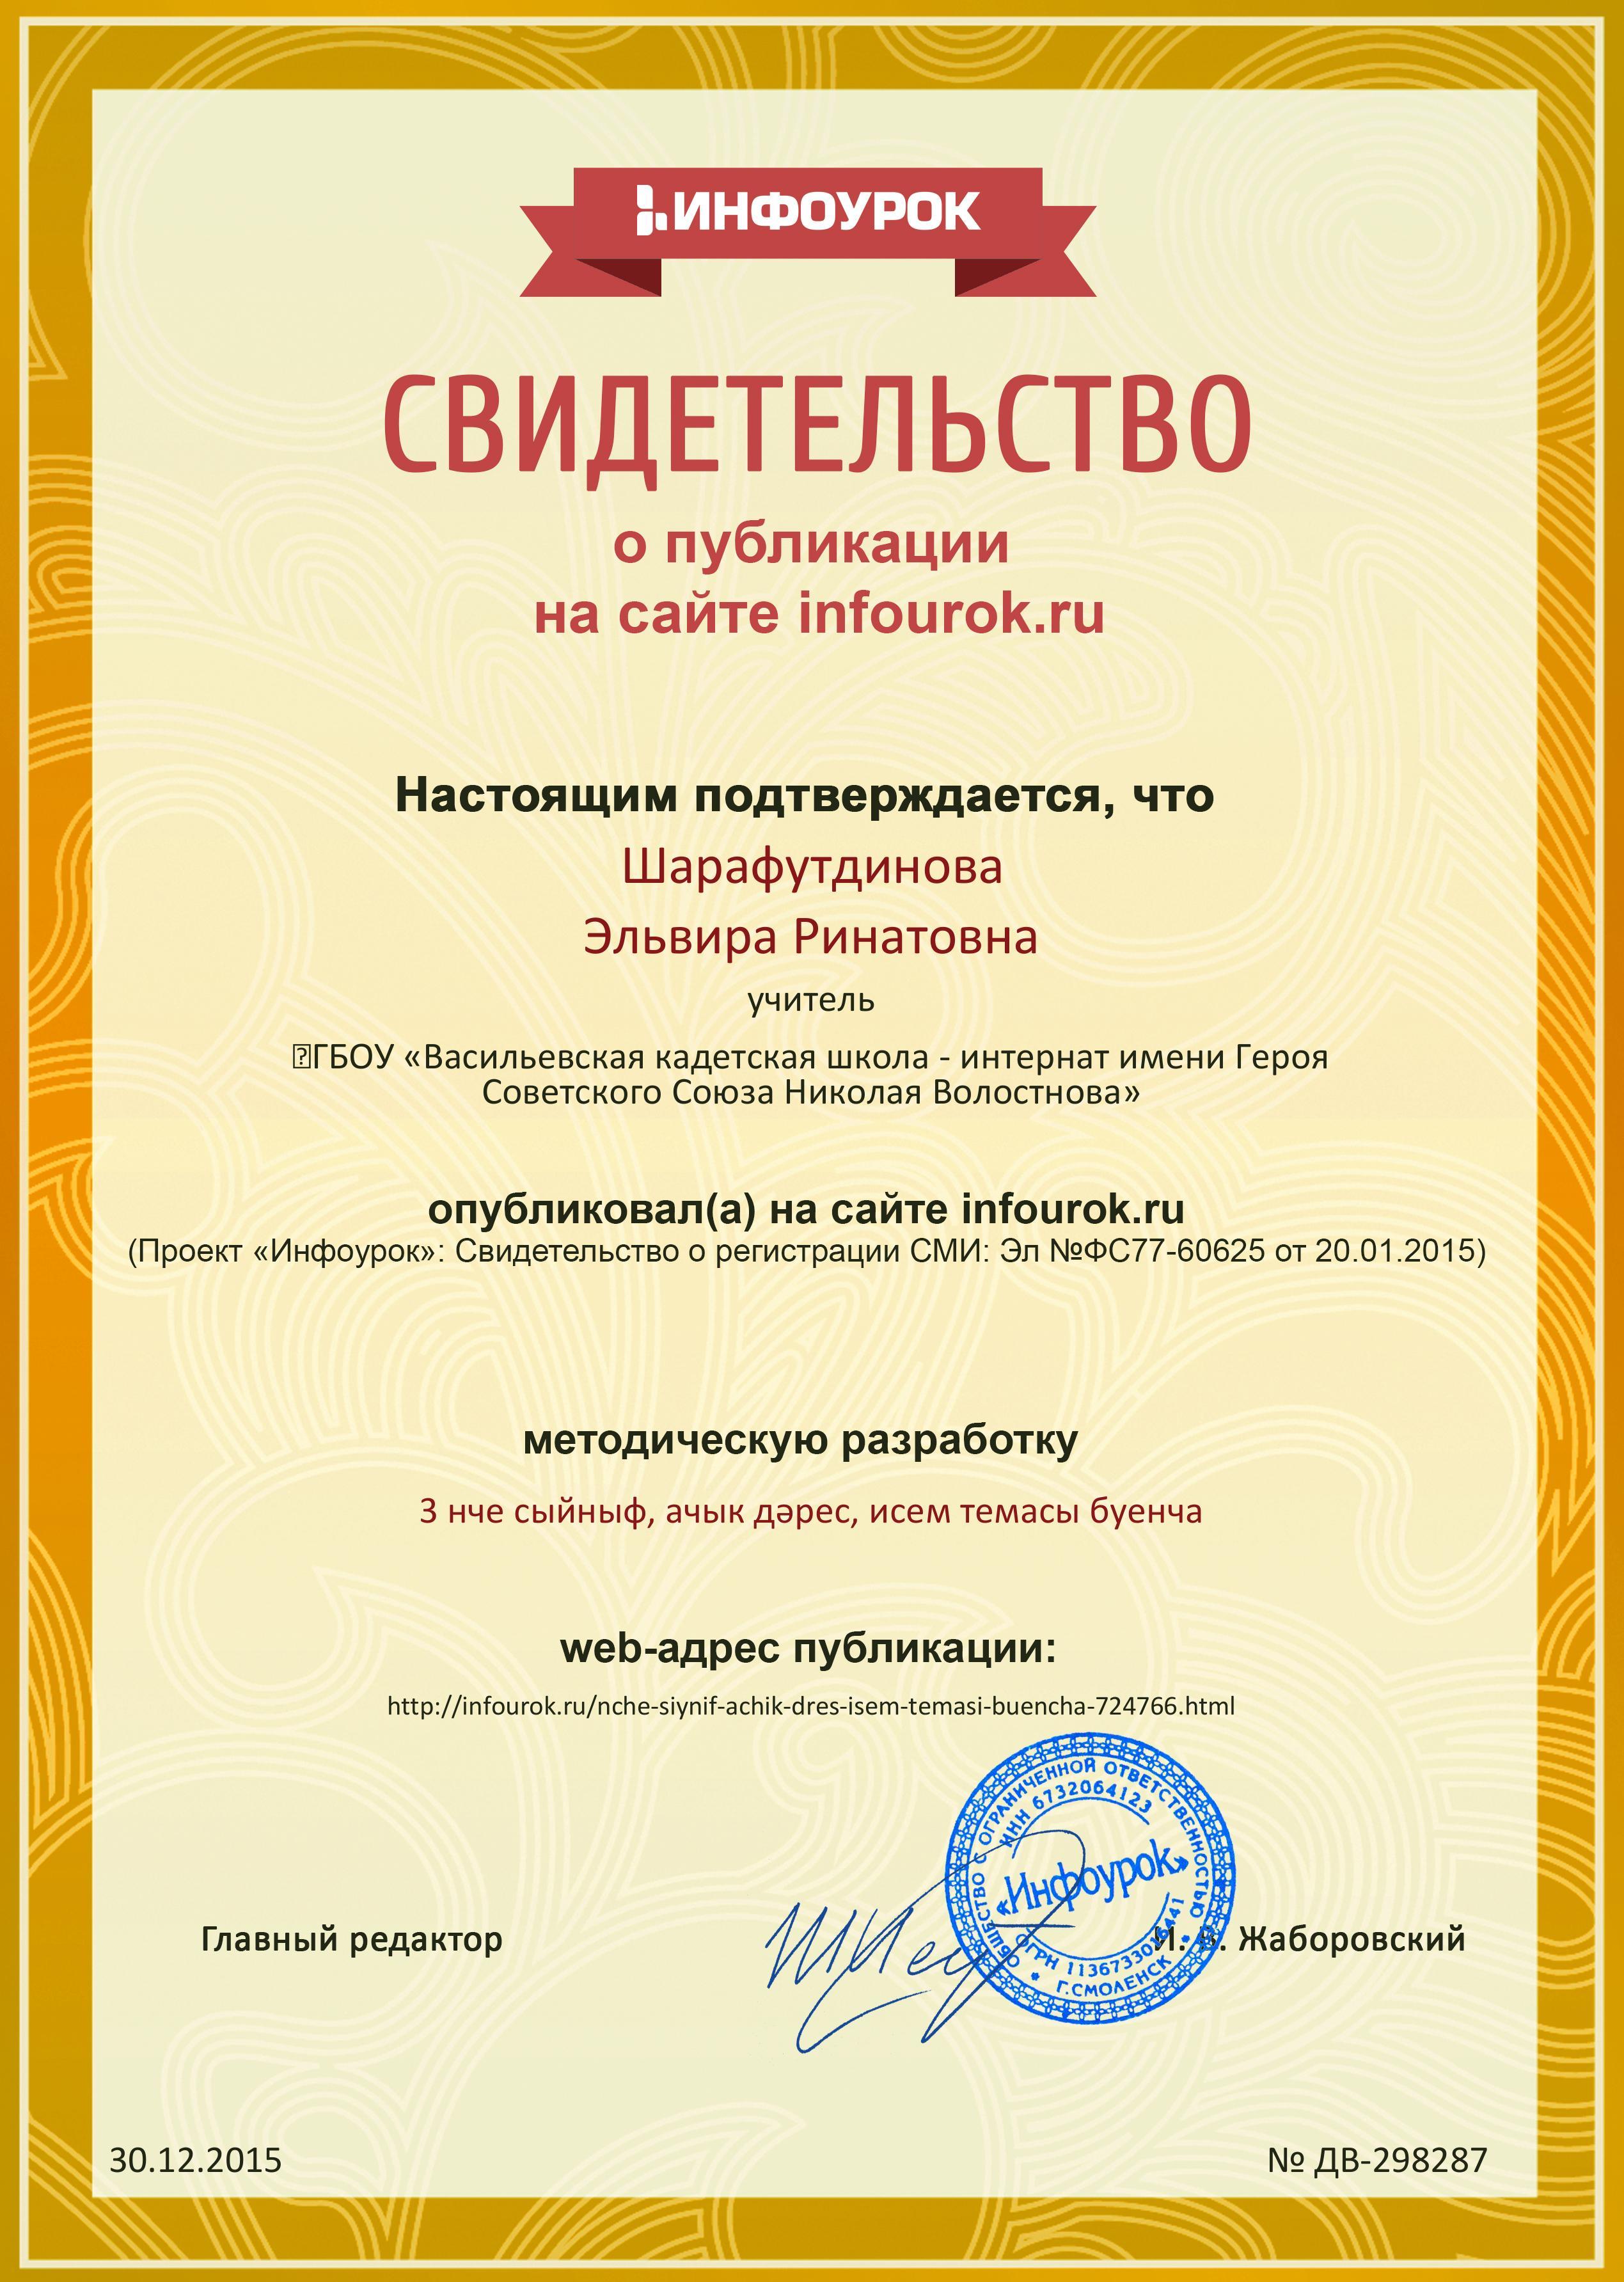 Сертификат проекта infourok.ru № ДВ-298287.jpg